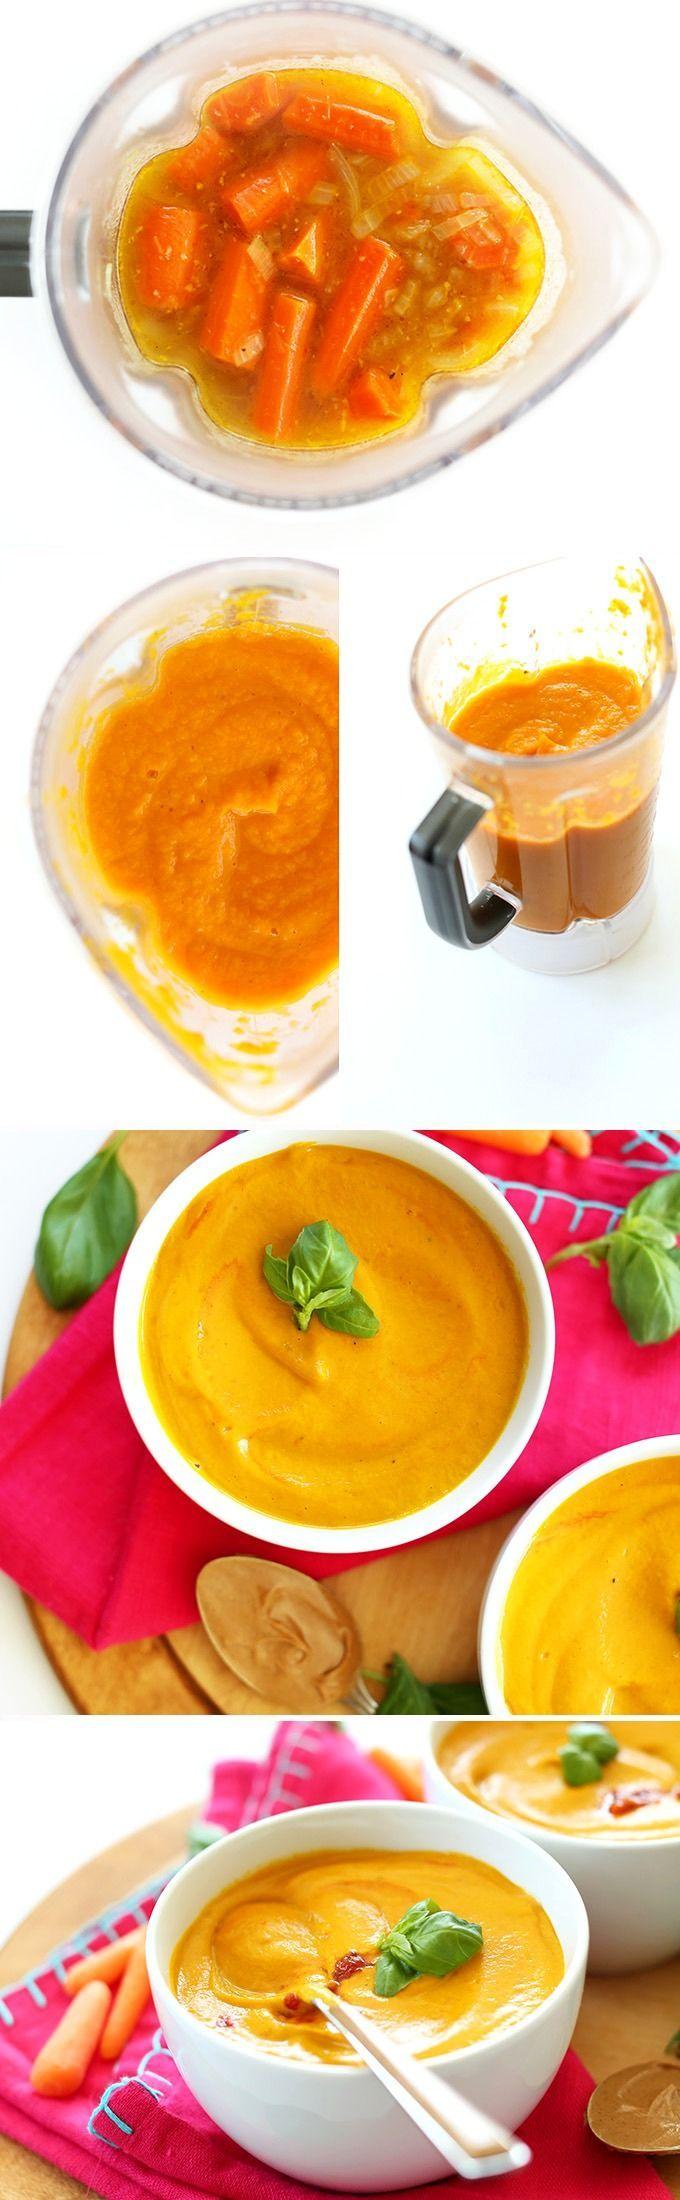 7 Ingredient Creamy Thai Carrot Soup with Basil! #Vegan, #glutenfree #healthy… http://minimalistbaker.com/creamy-thai-carrot-soup-with-basil/